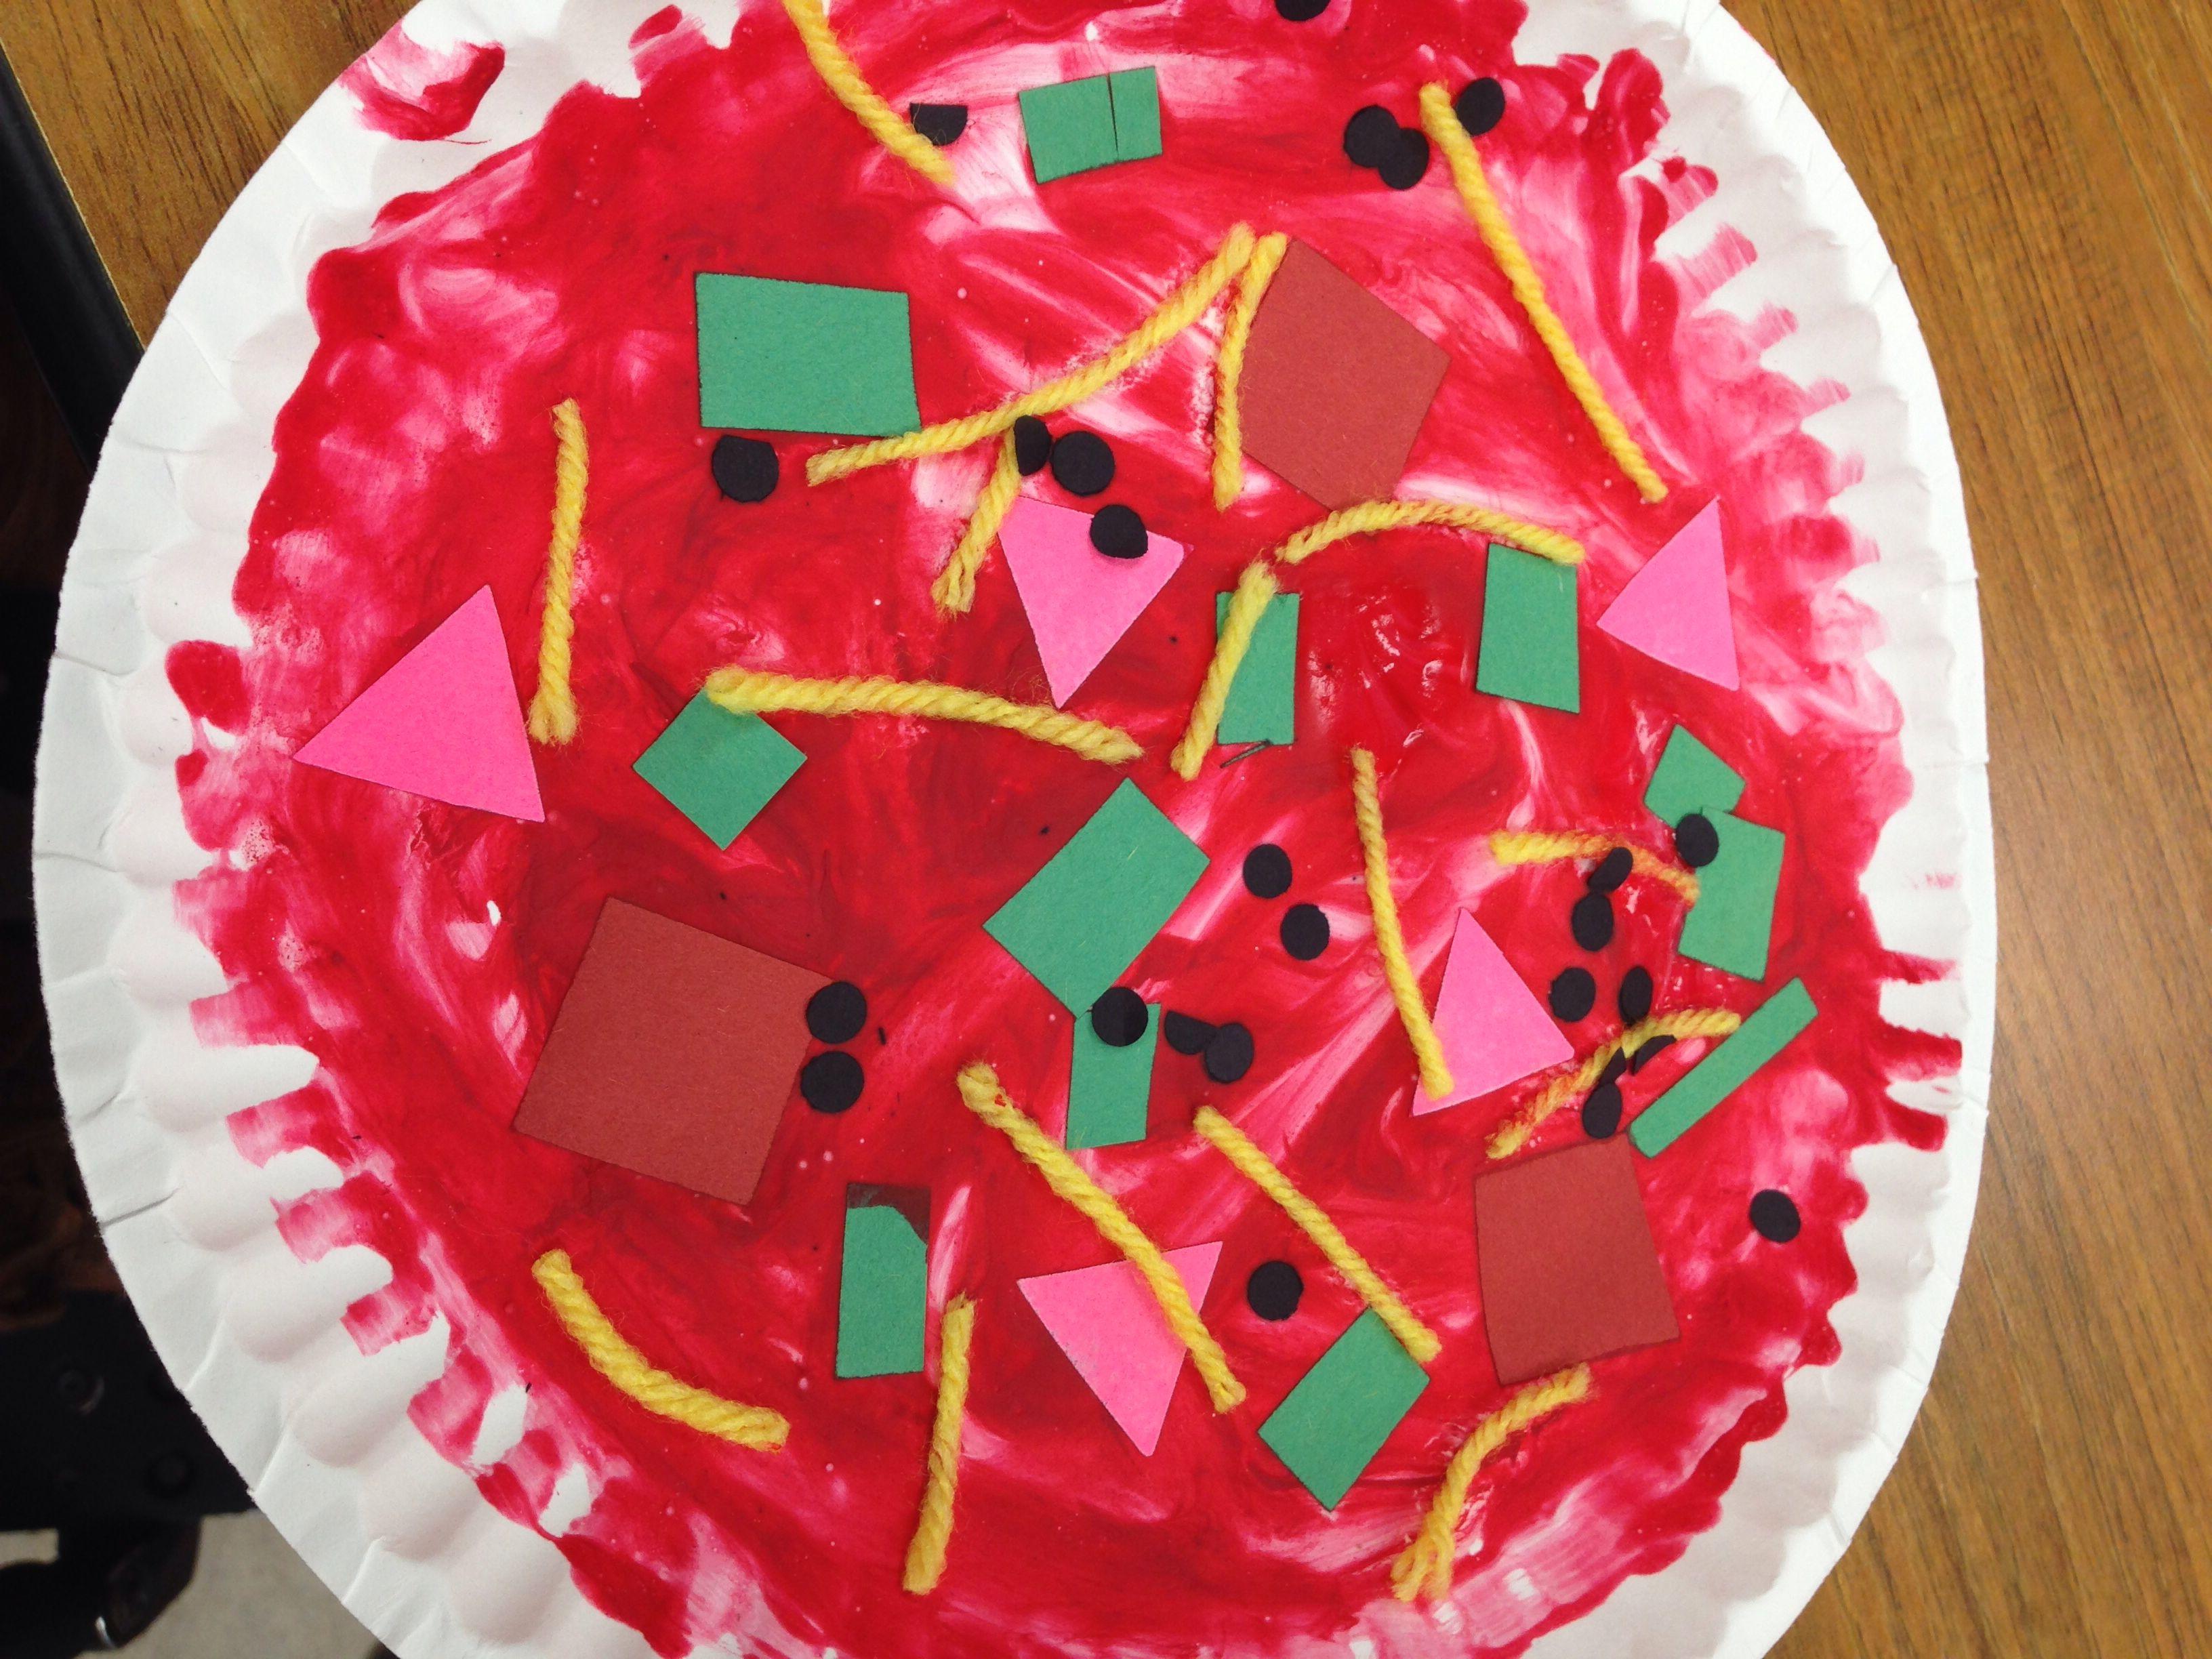 Pizza Preschool Art Project Paper Plate As Dough Red